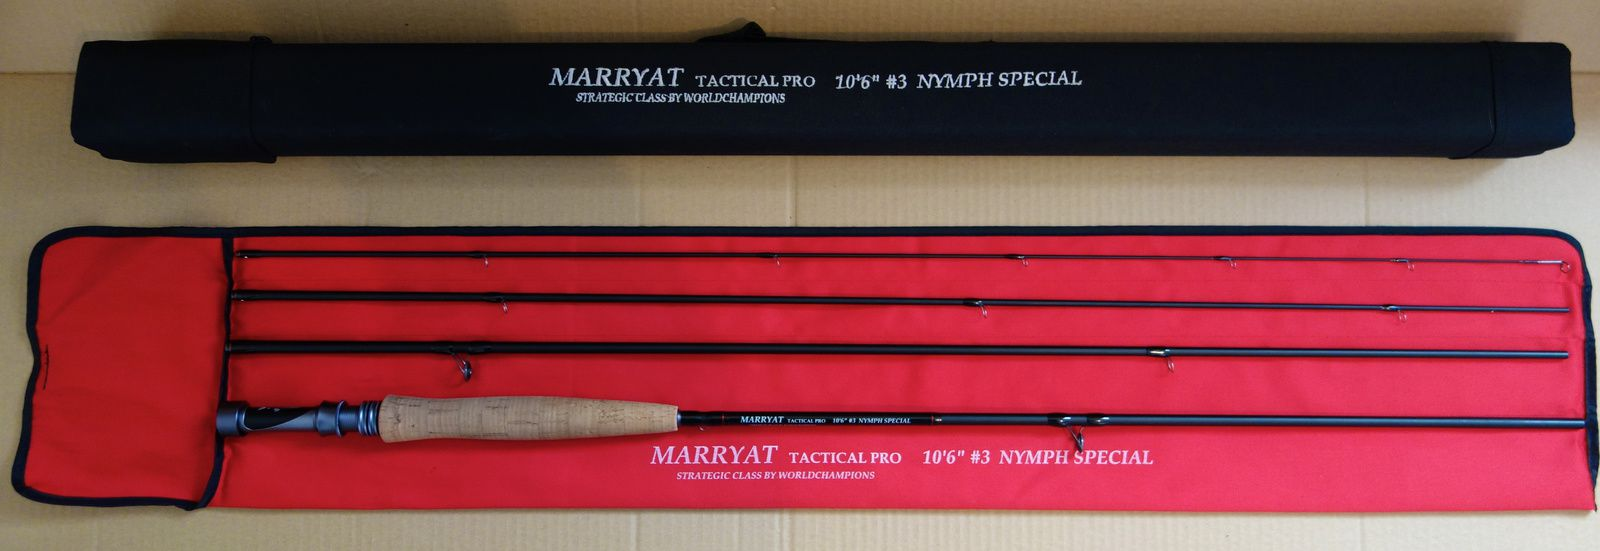 Marryat tactical pro 10'6 soie 3 nymph special